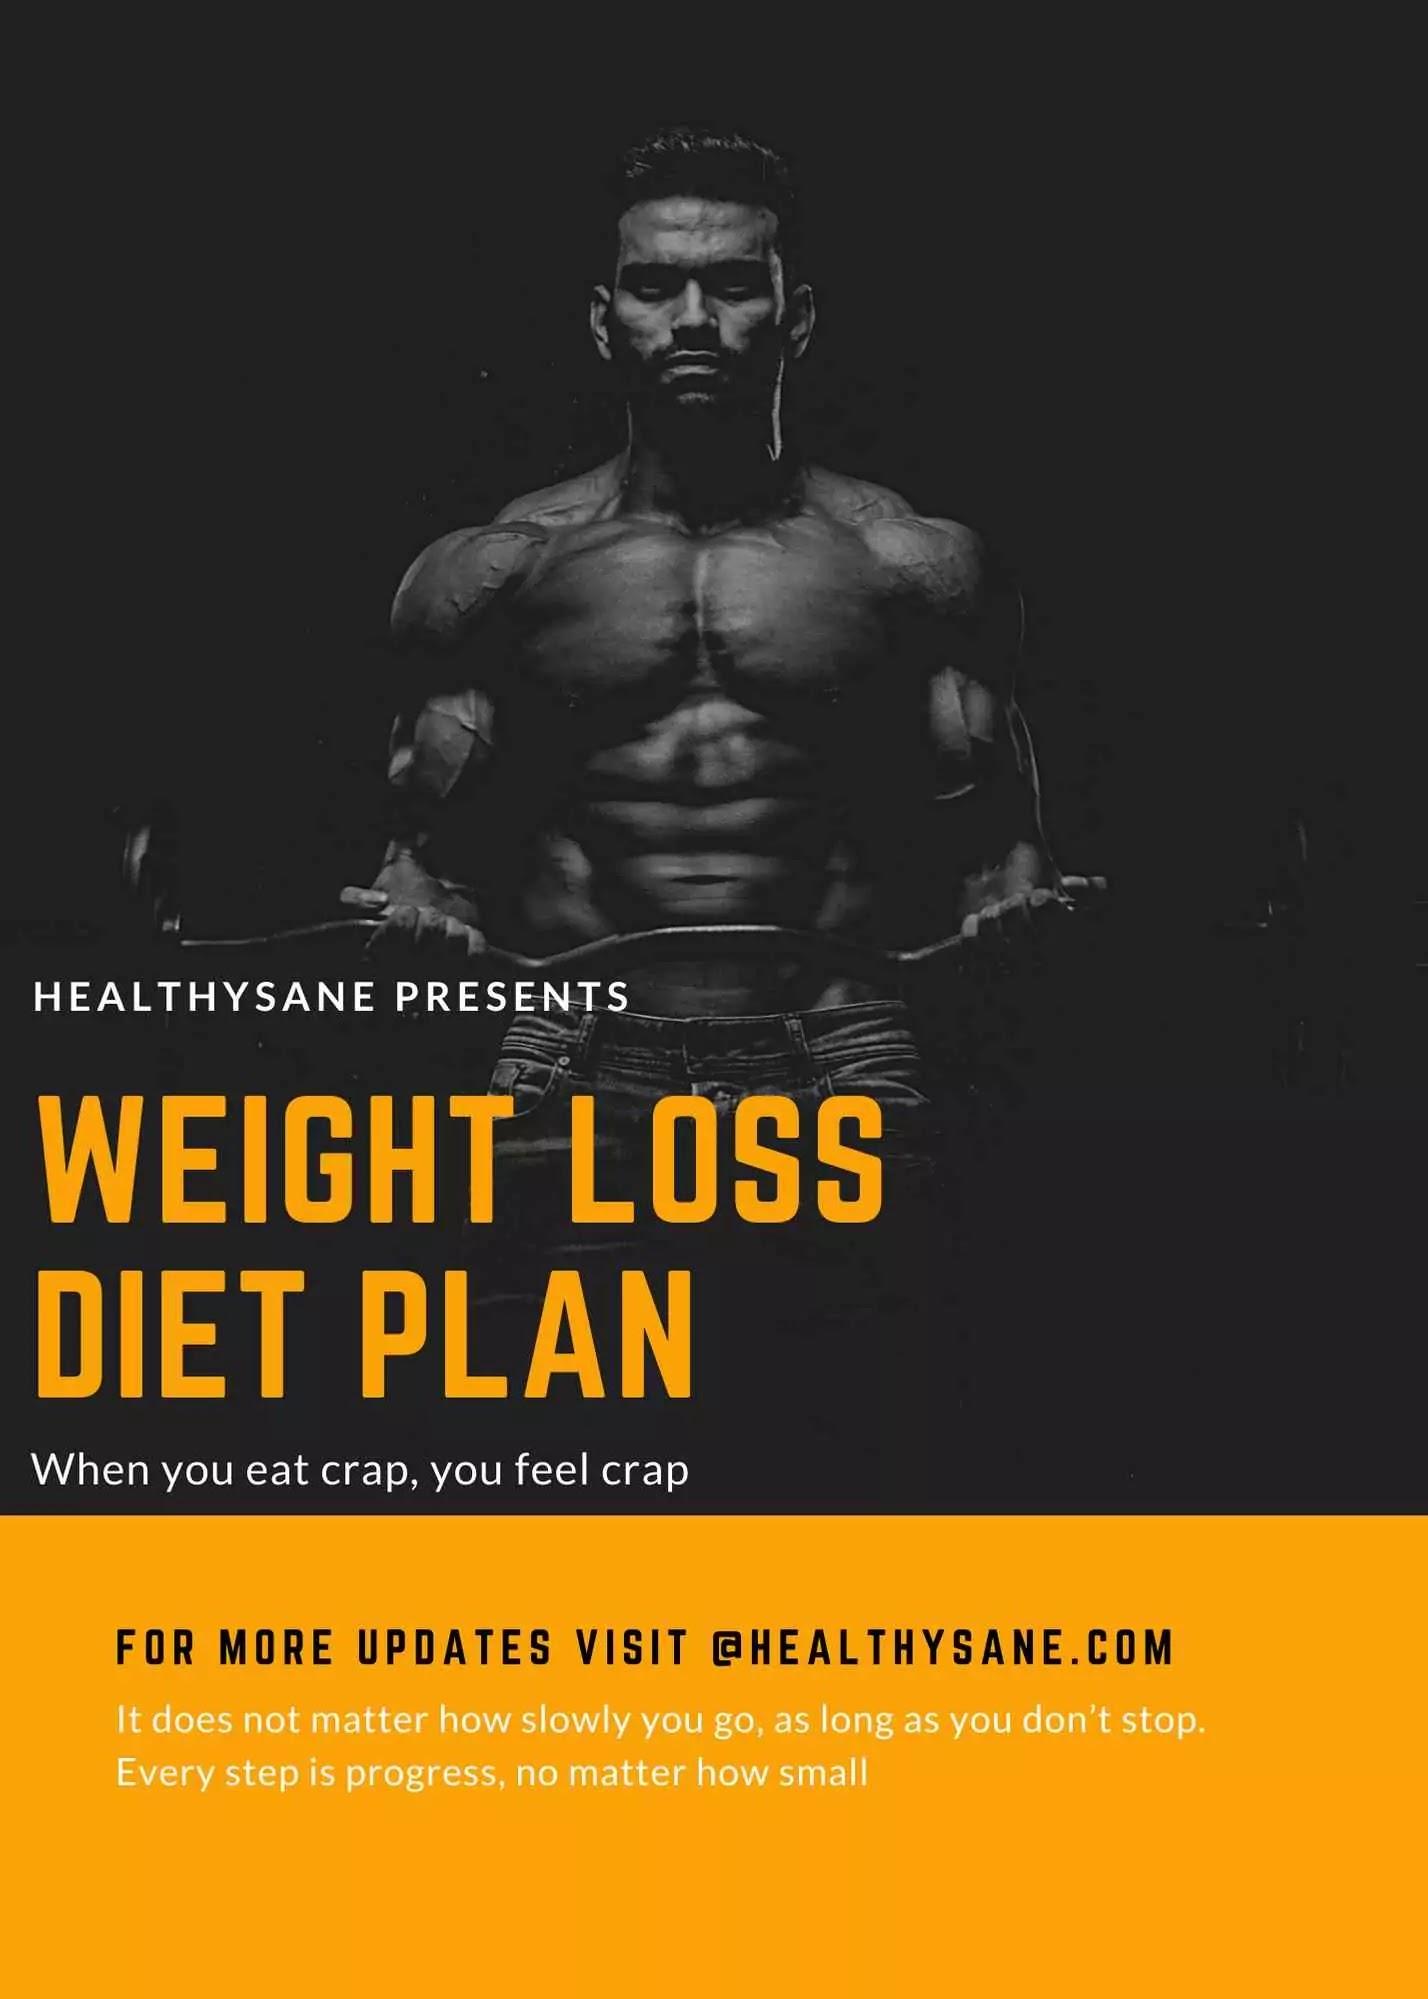 Weight loss, diet plan, diet, vegan diet, fitness